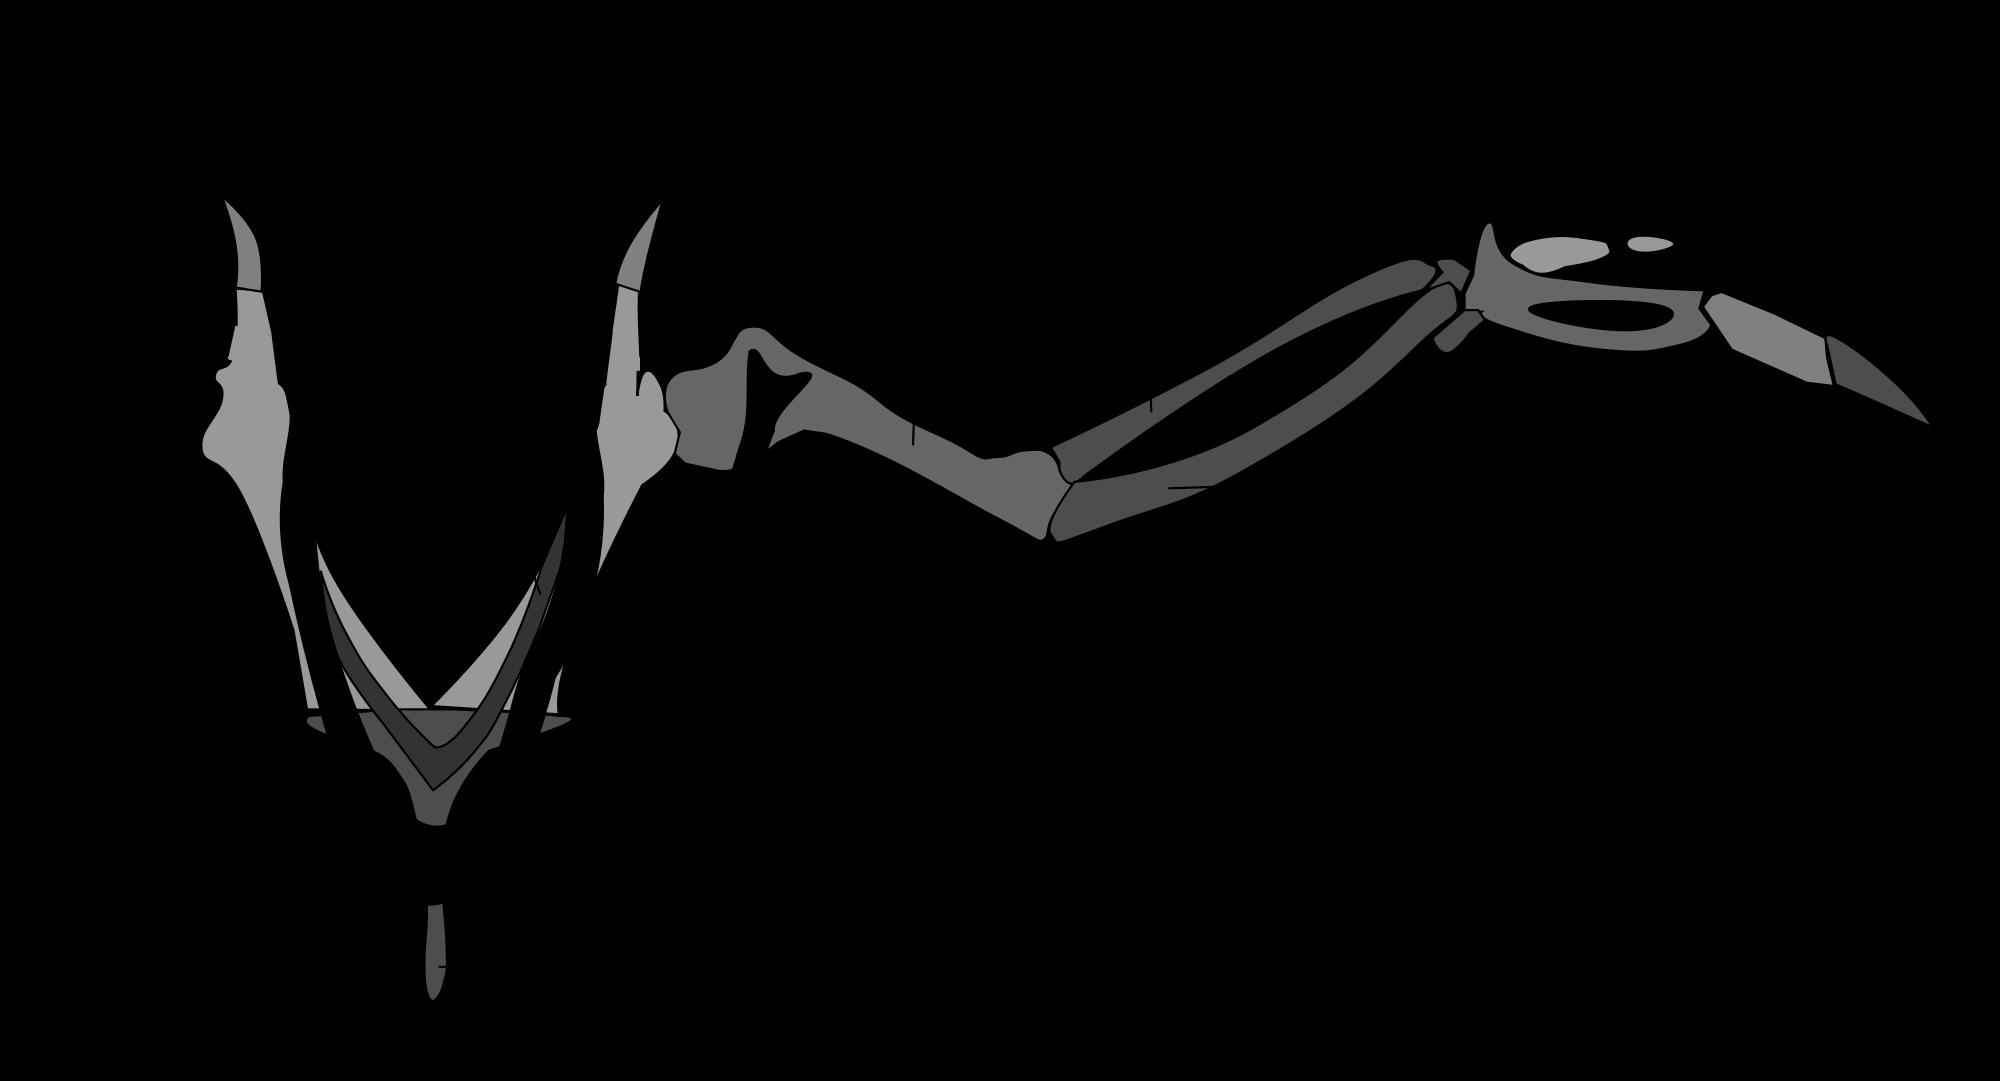 muscle orientation wings - Google Search | Robots Etc. | Pinterest ...